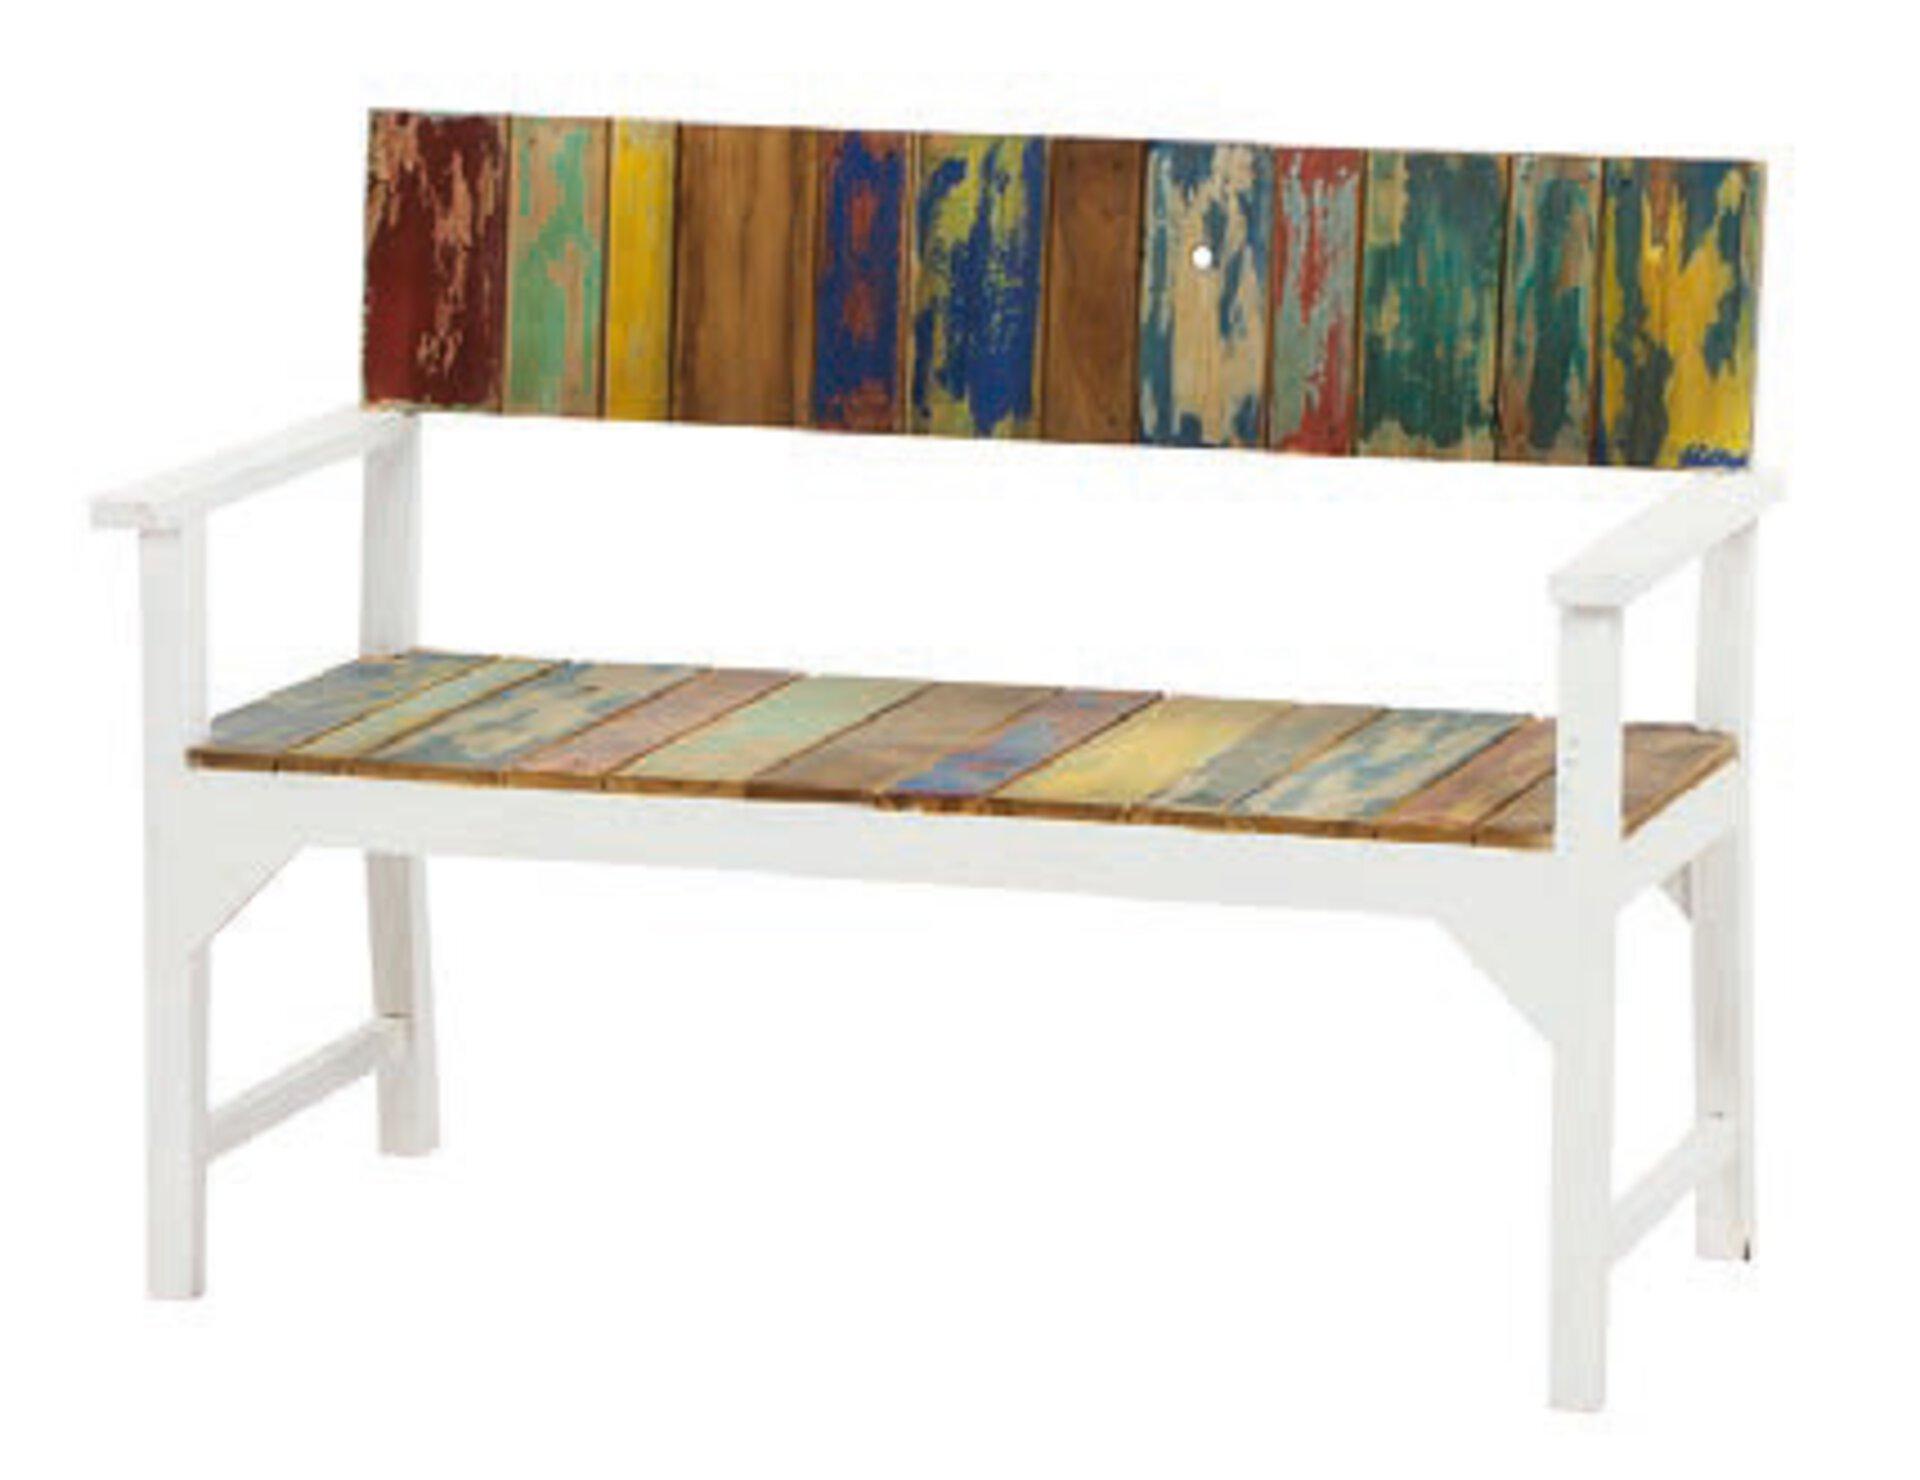 Gartenbank LOREO Siena Garden Holz mehrfarbig 124 x 90 x 57 cm